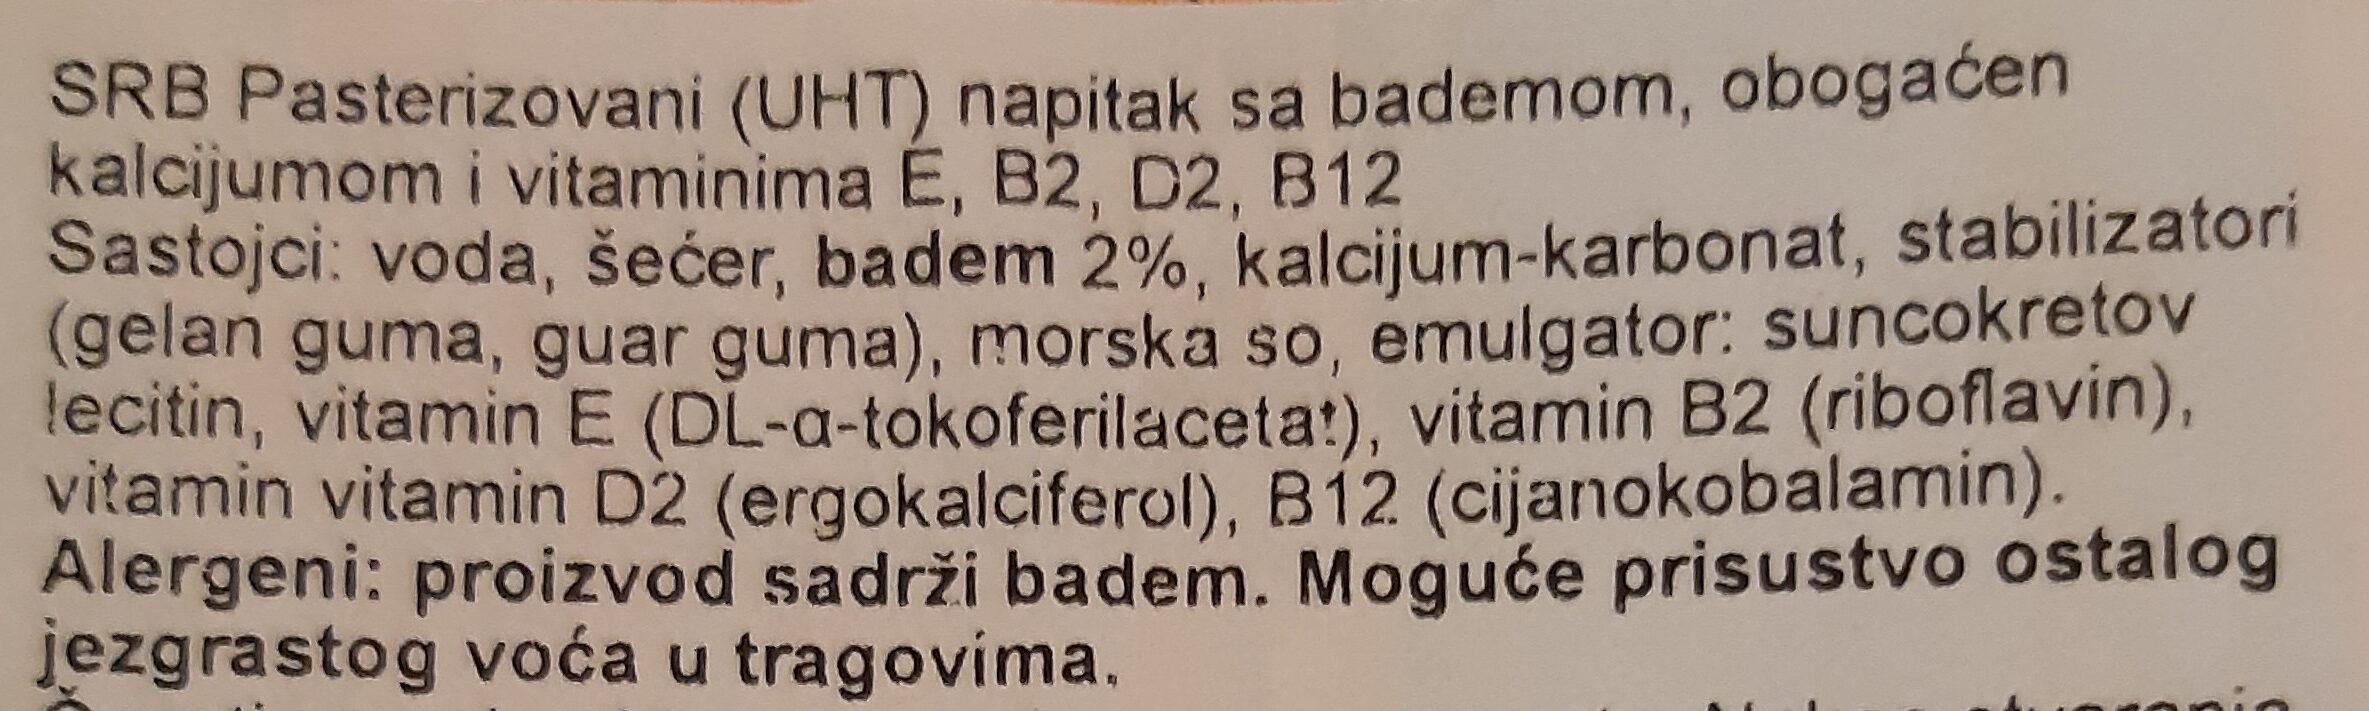 Lait amande - Ingredients - sr